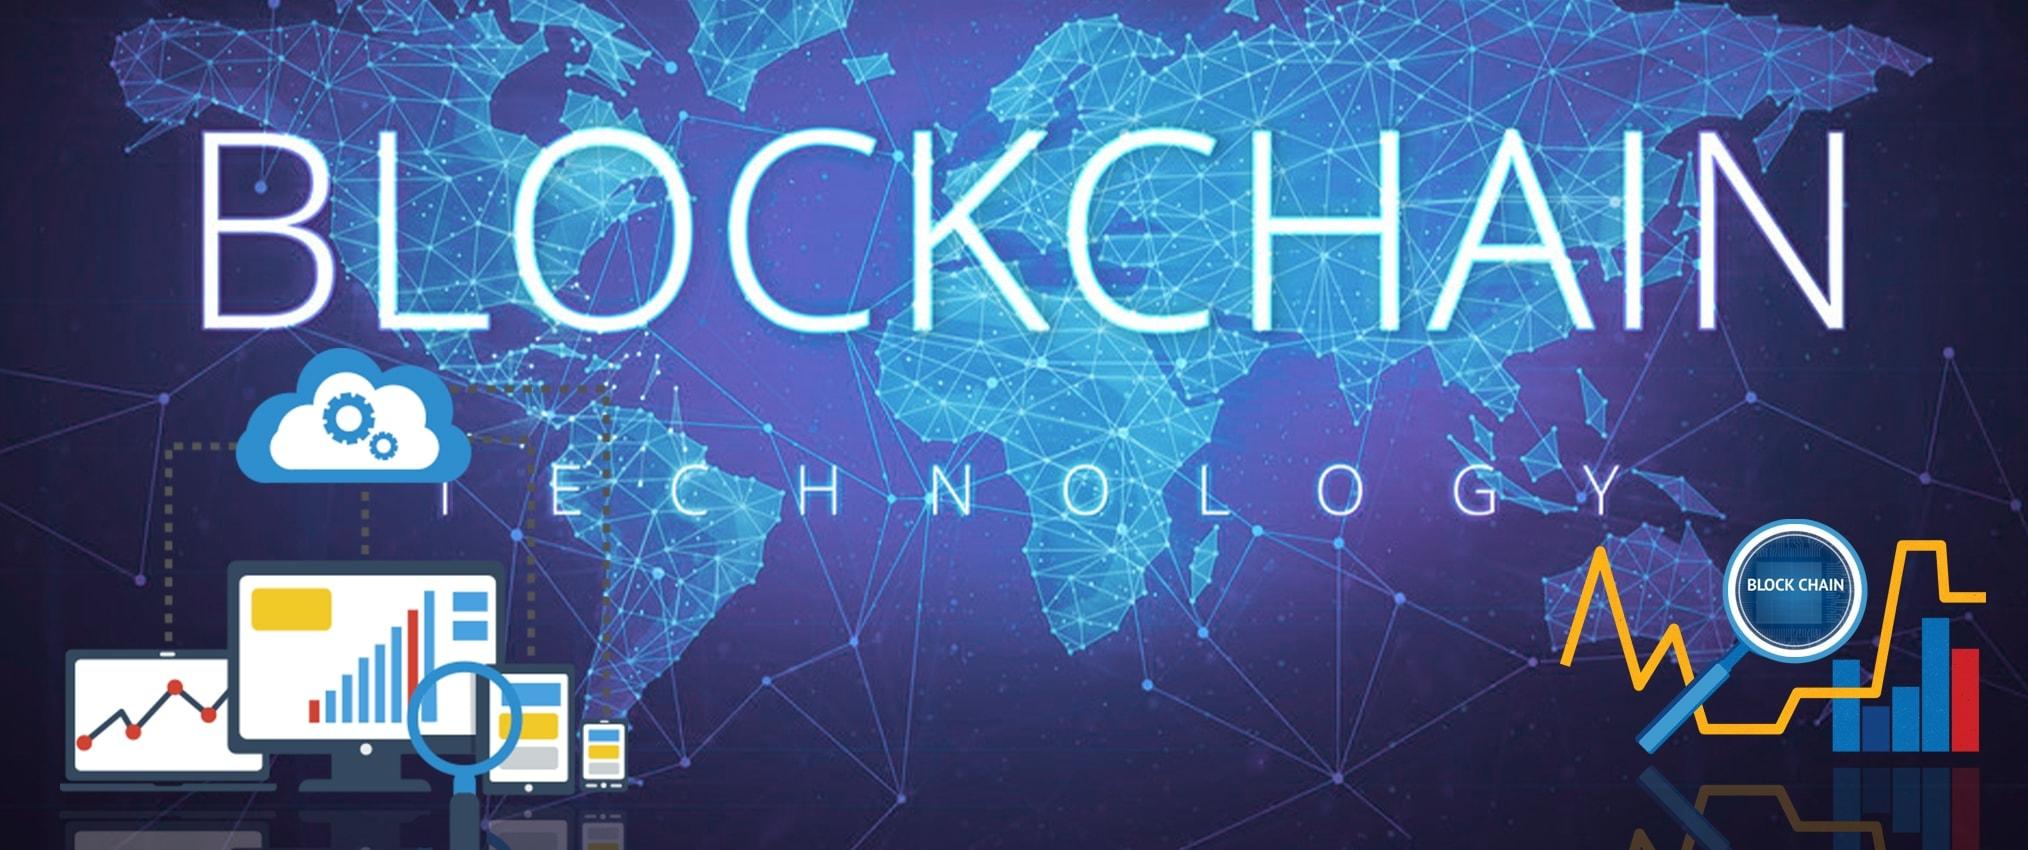 blockchain technology data analytics business